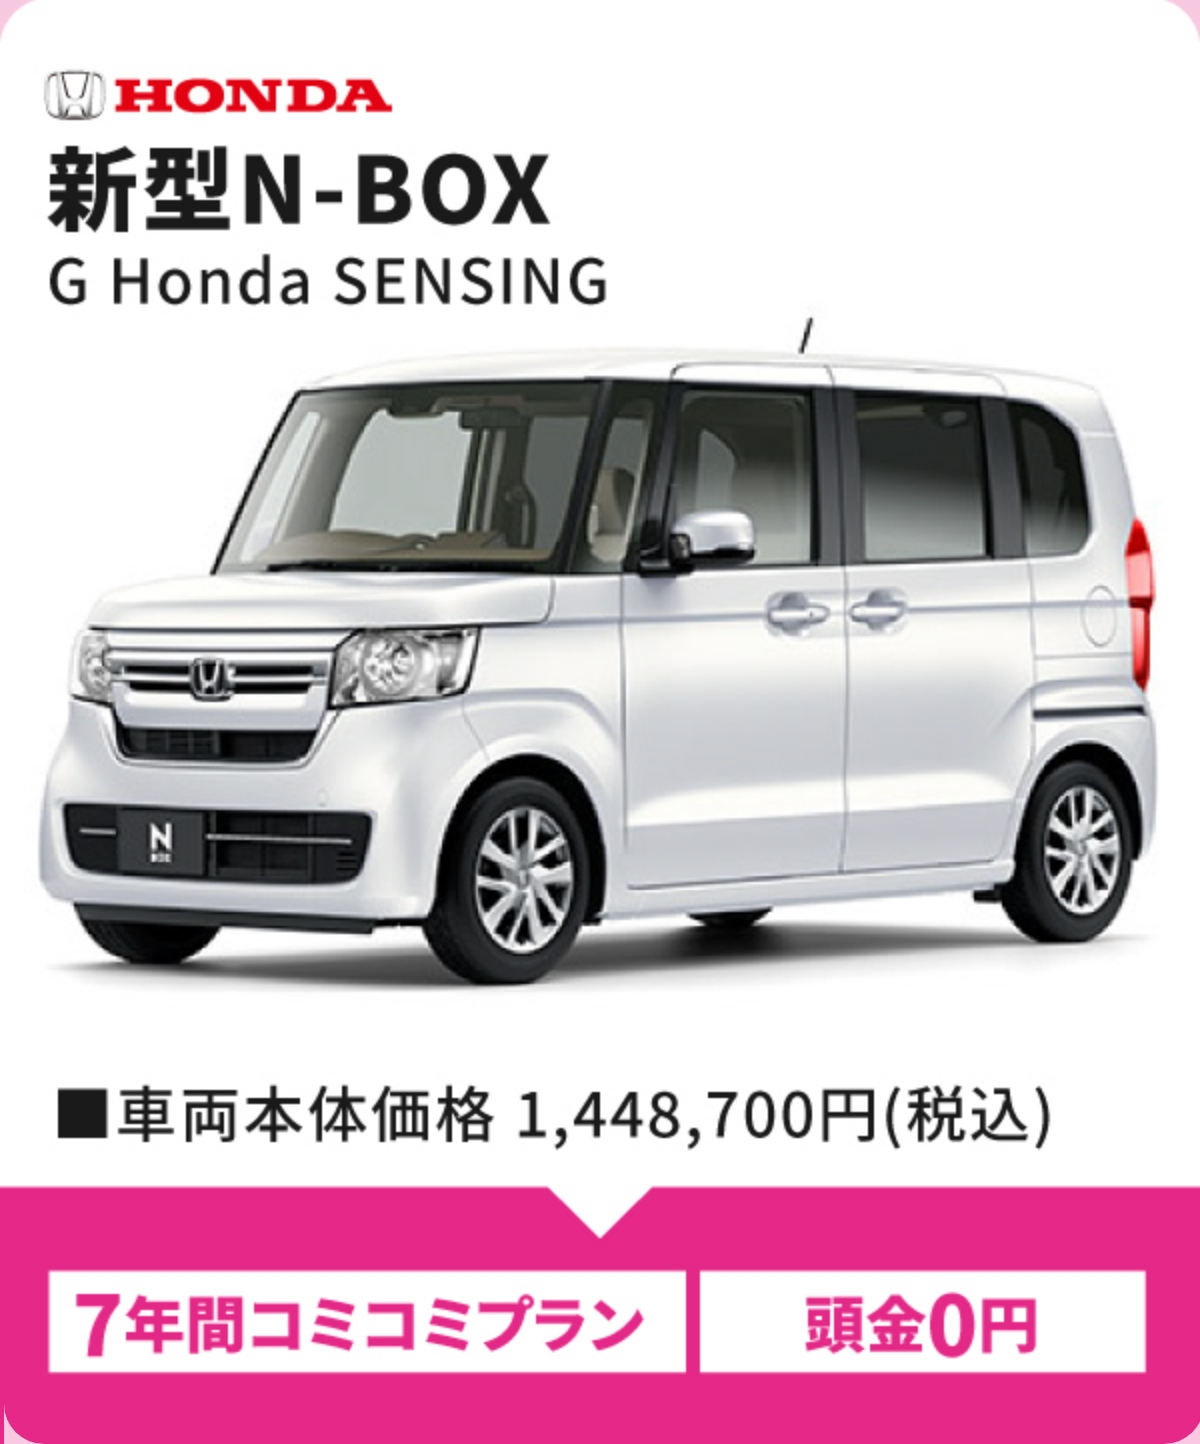 N-BOX 月々13,200円(税込)